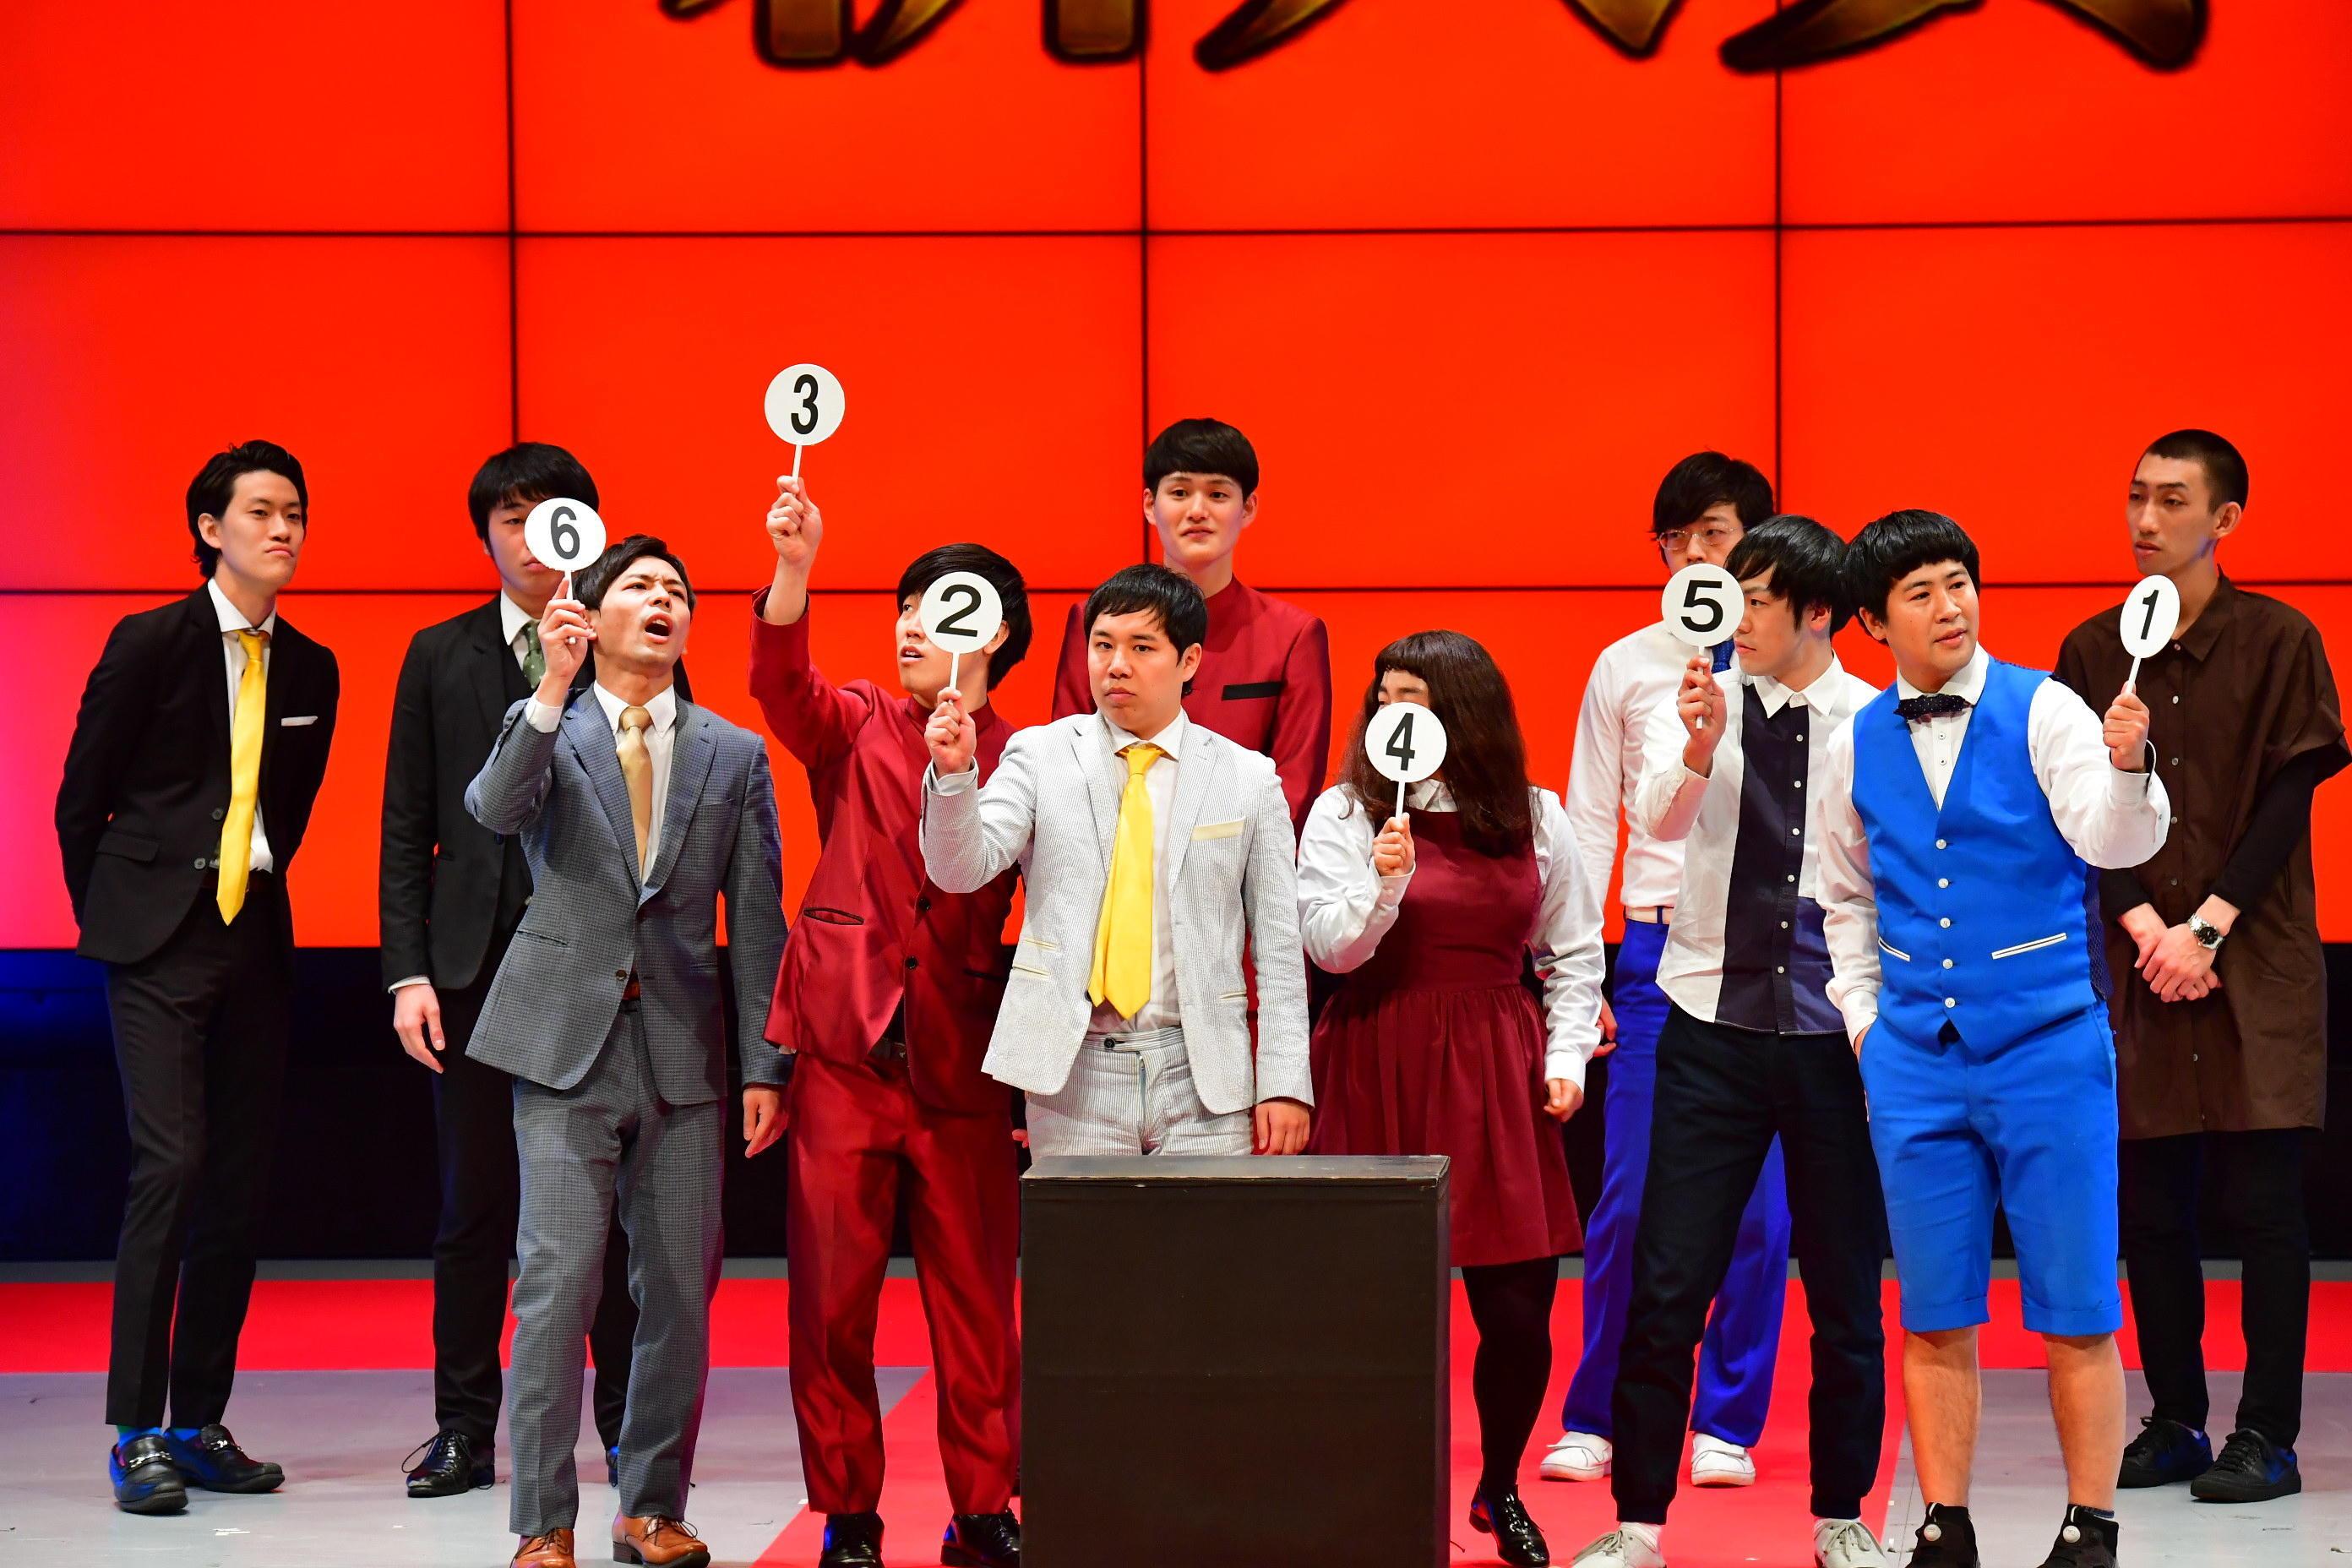 http://news.yoshimoto.co.jp/20180109015108-4fefff5a7beb2df176c4b6638cf0904b63b1f9b6.jpg